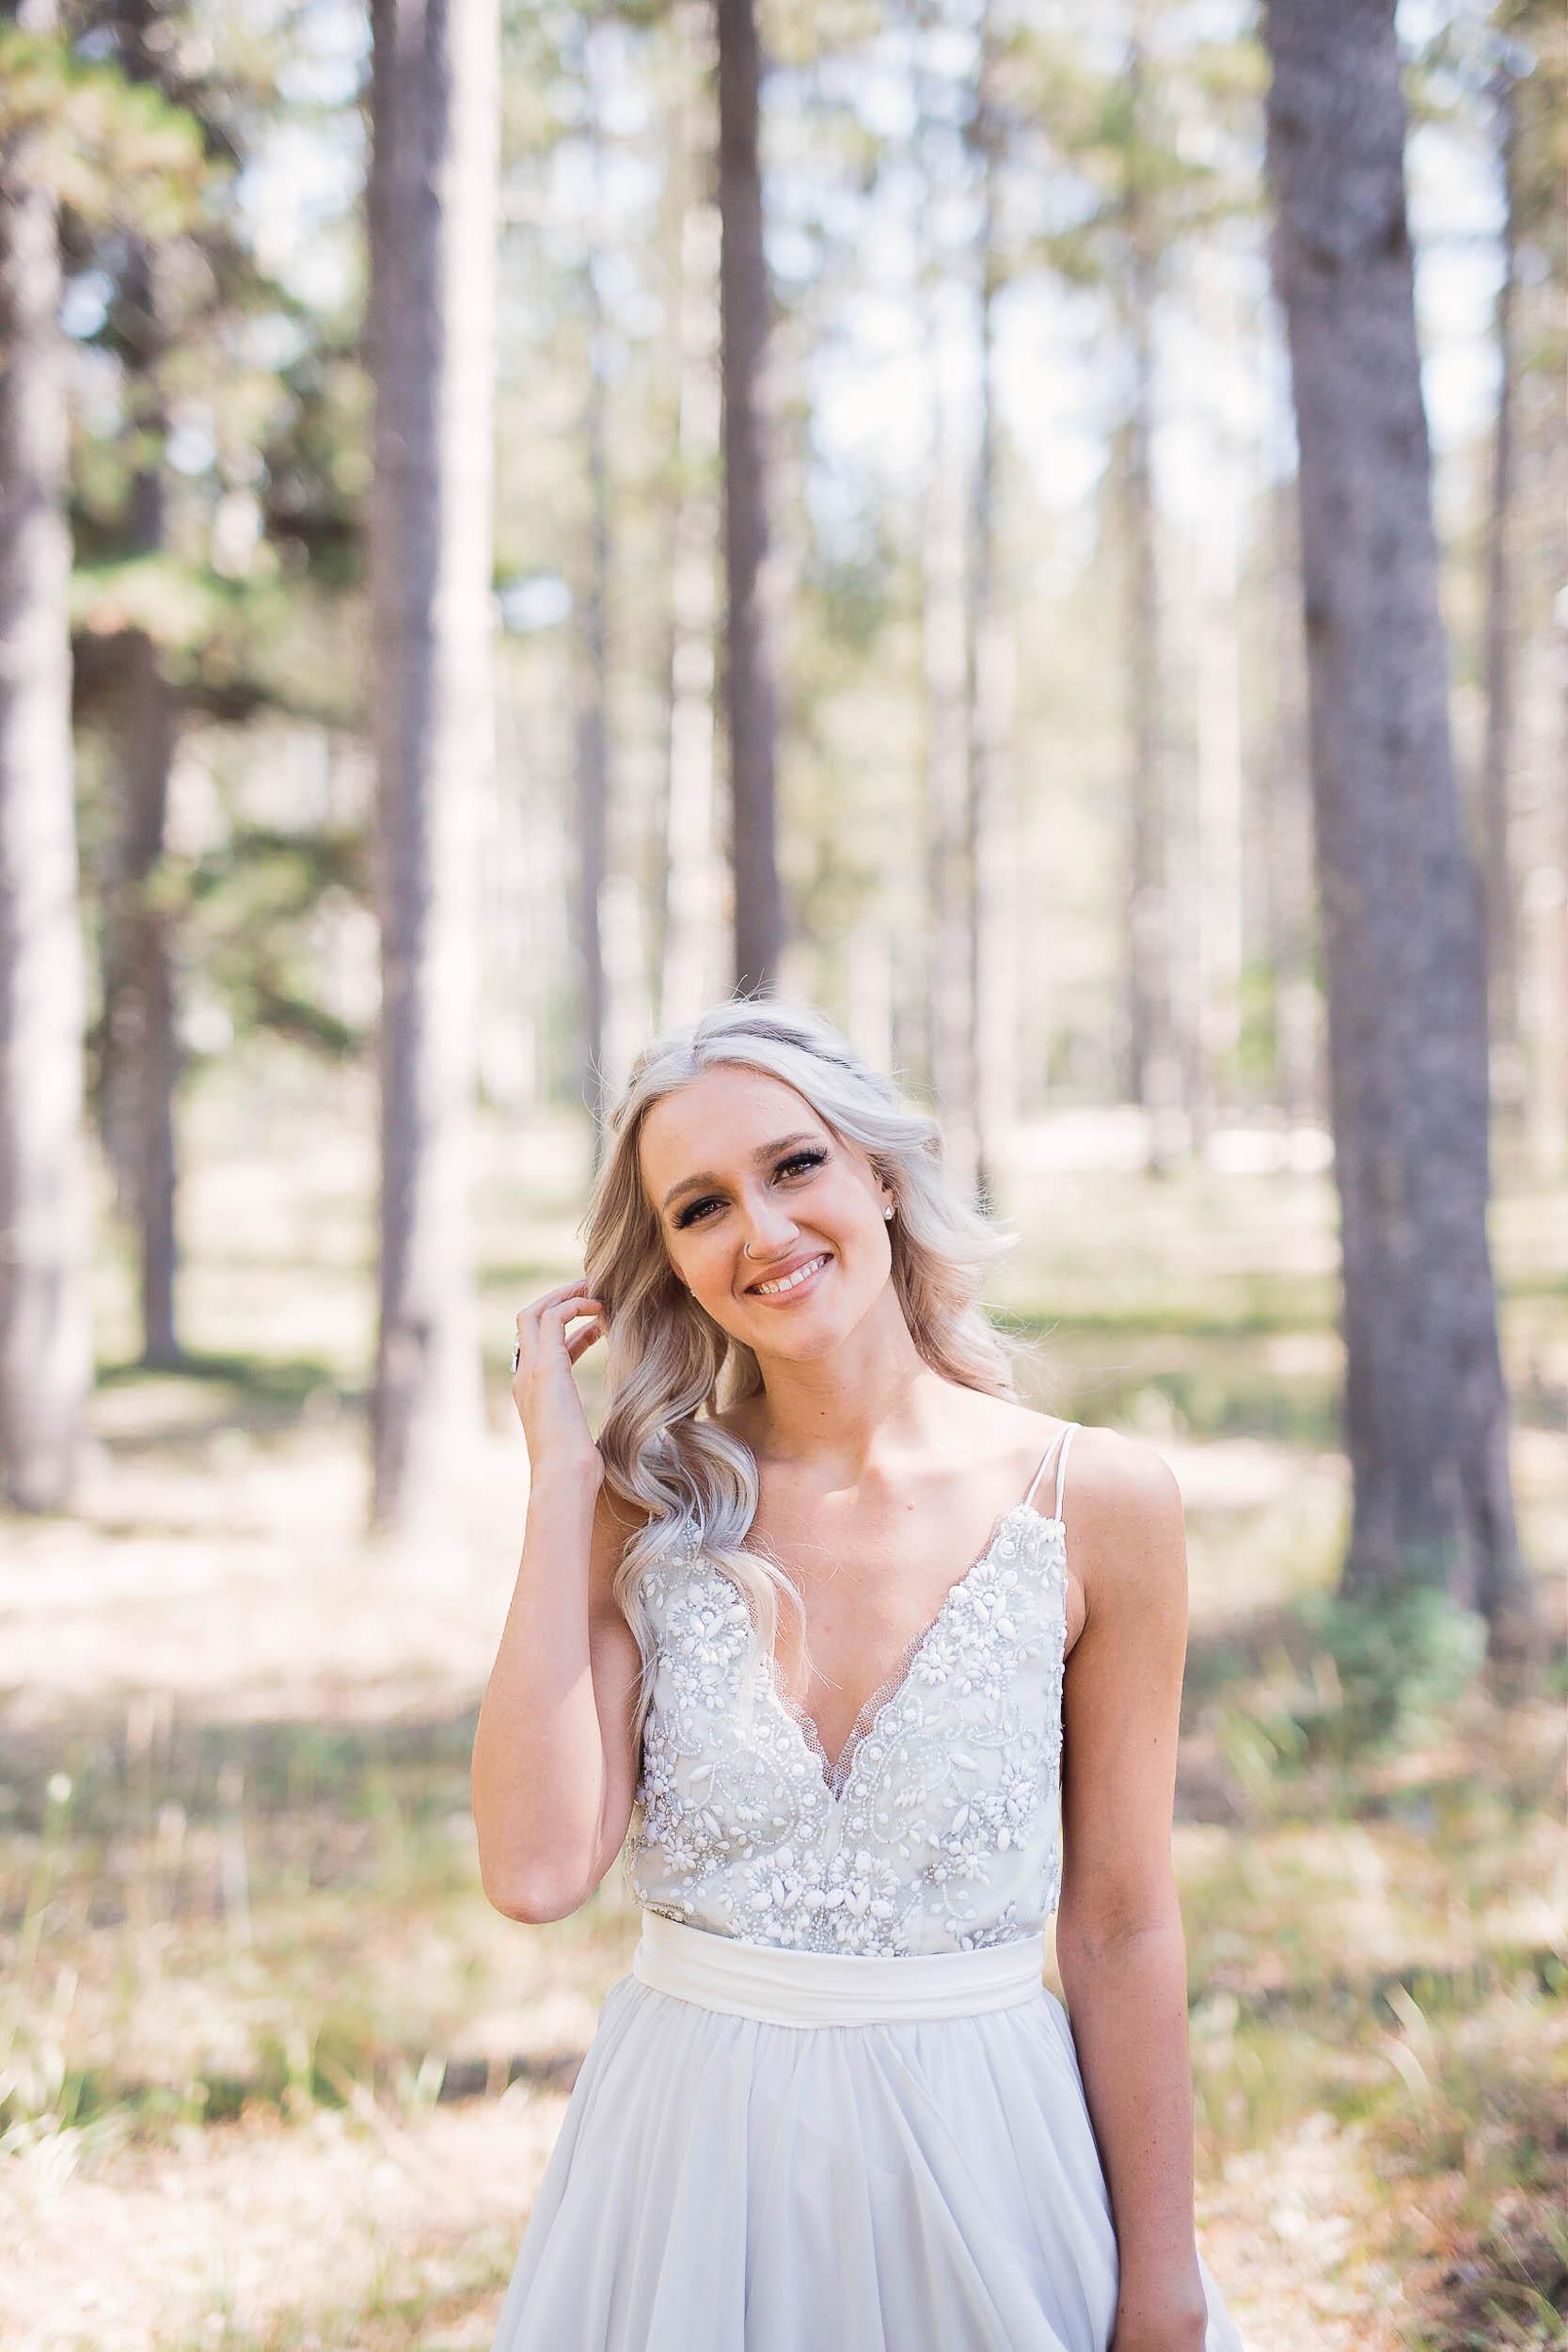 KyleLovesTori-Casper-Wyoming-Wedding-53.jpg